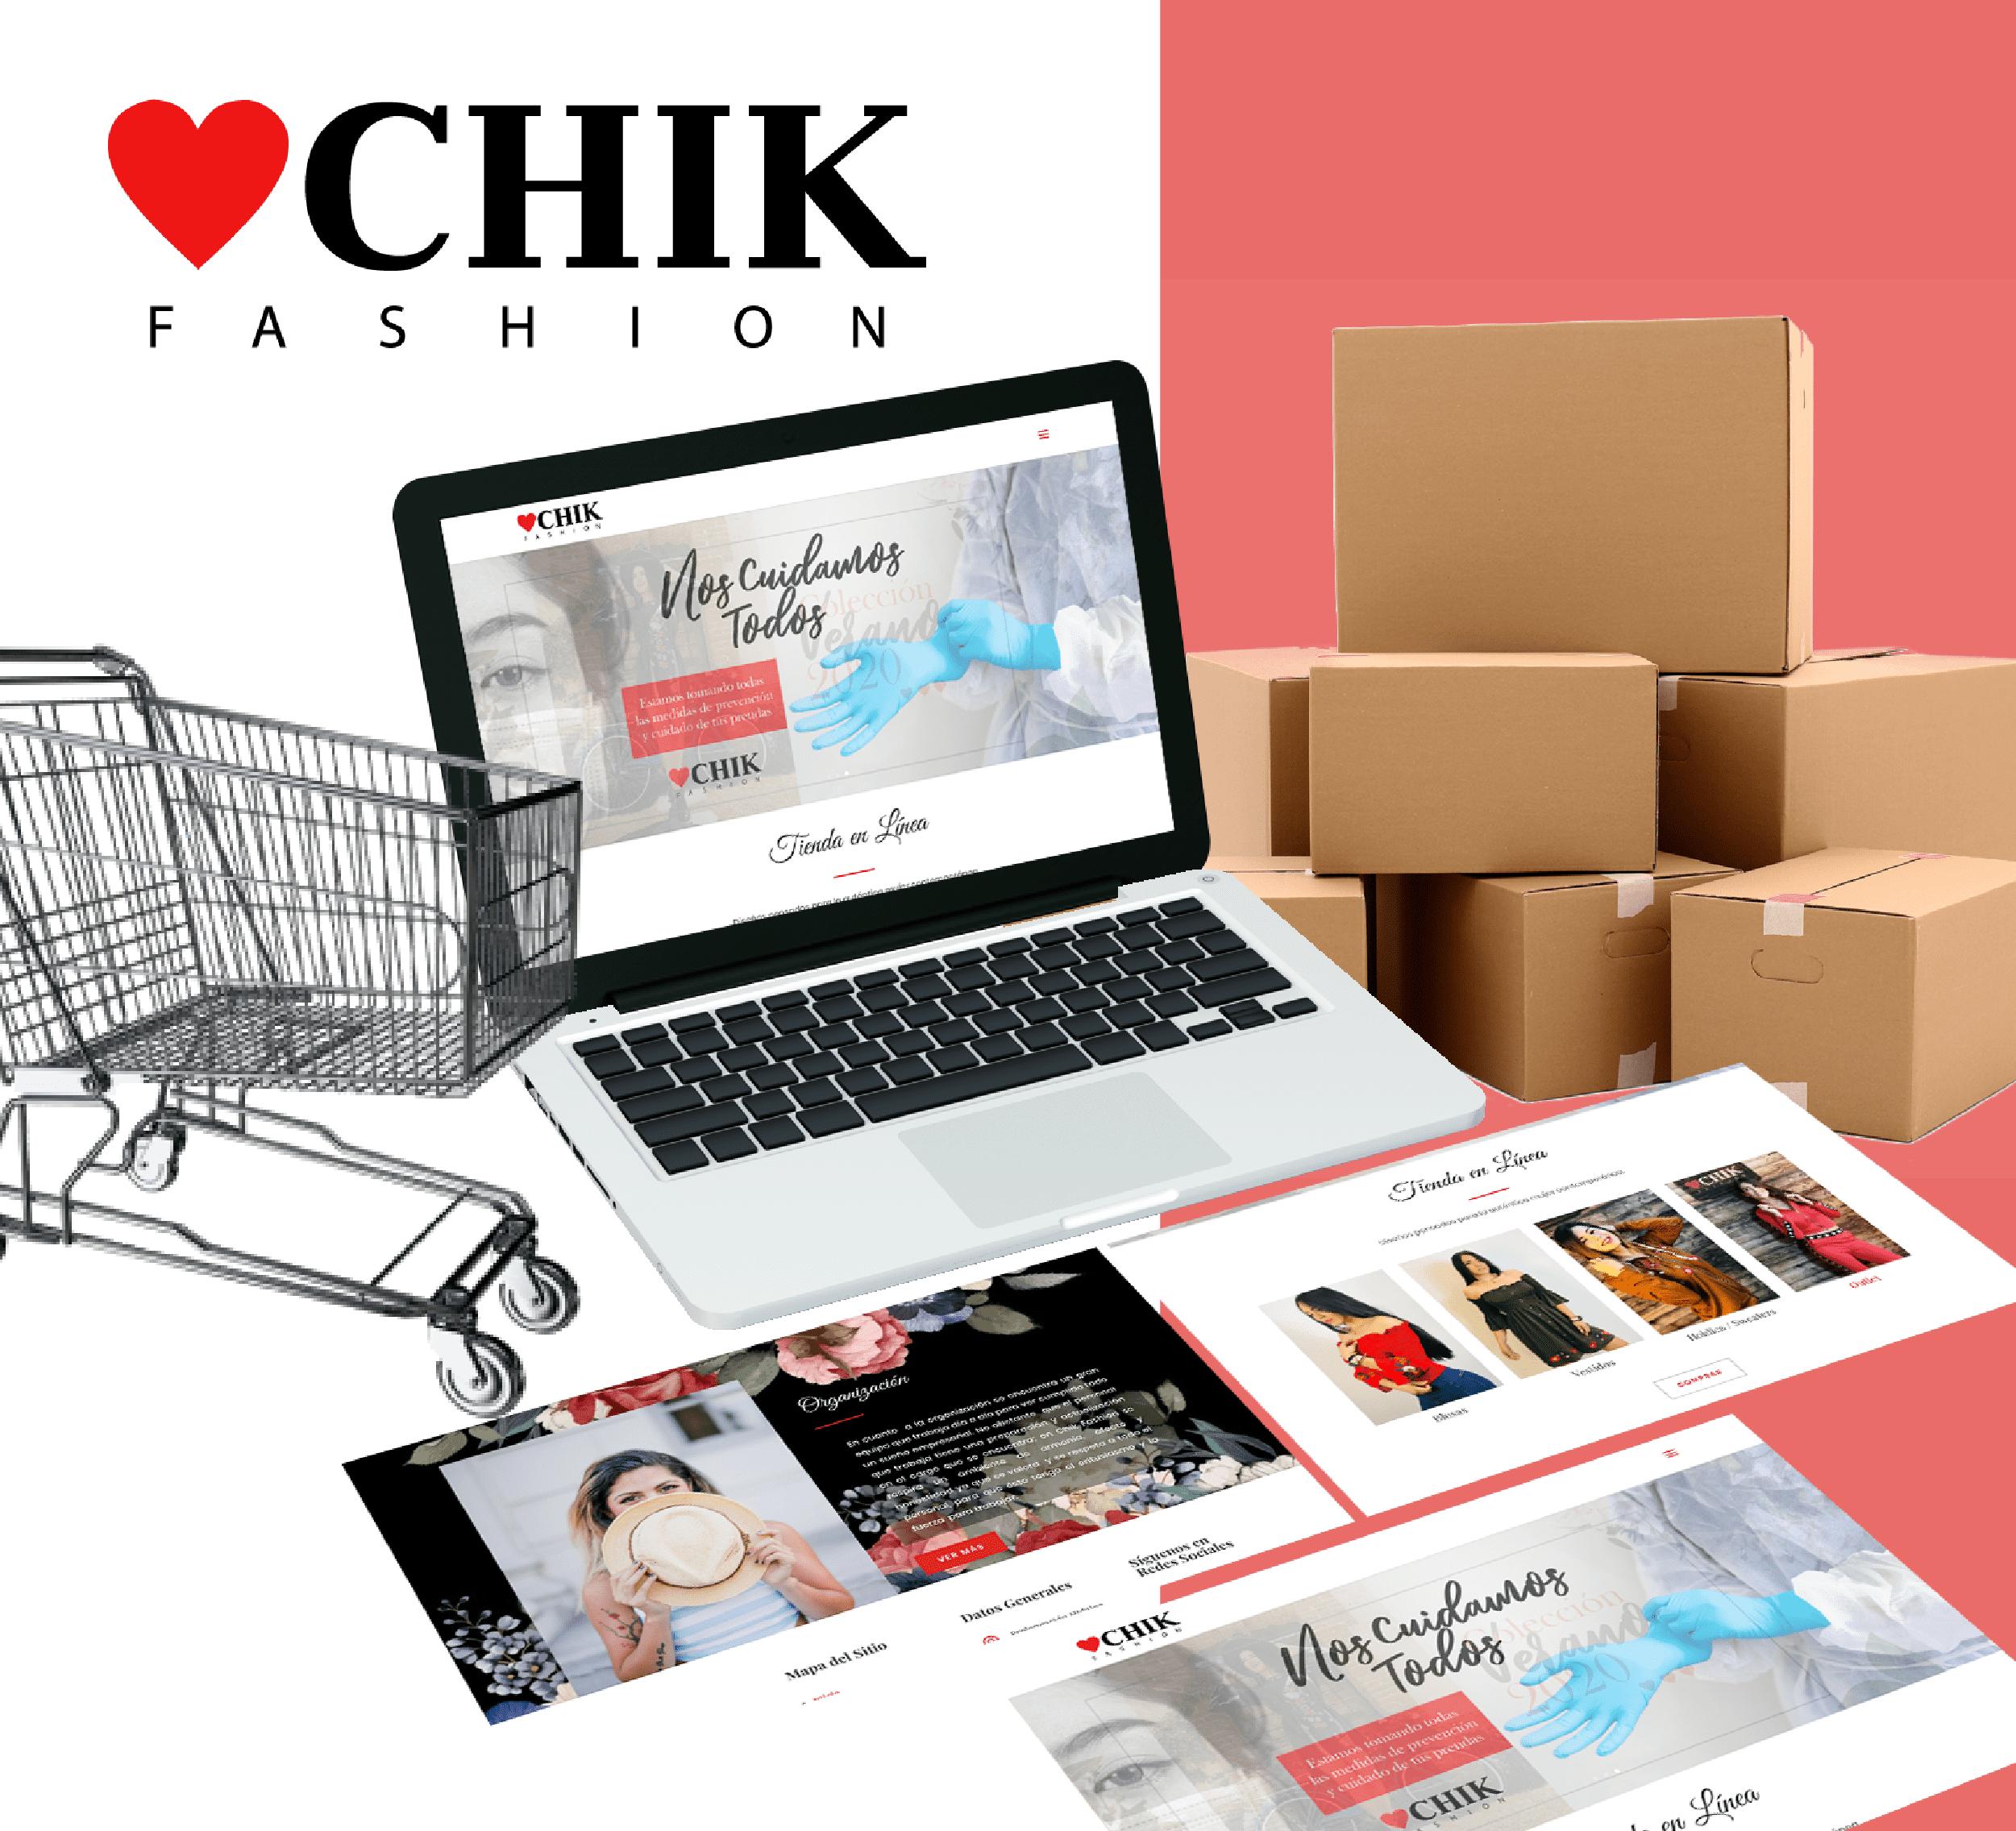 Chik Fashion